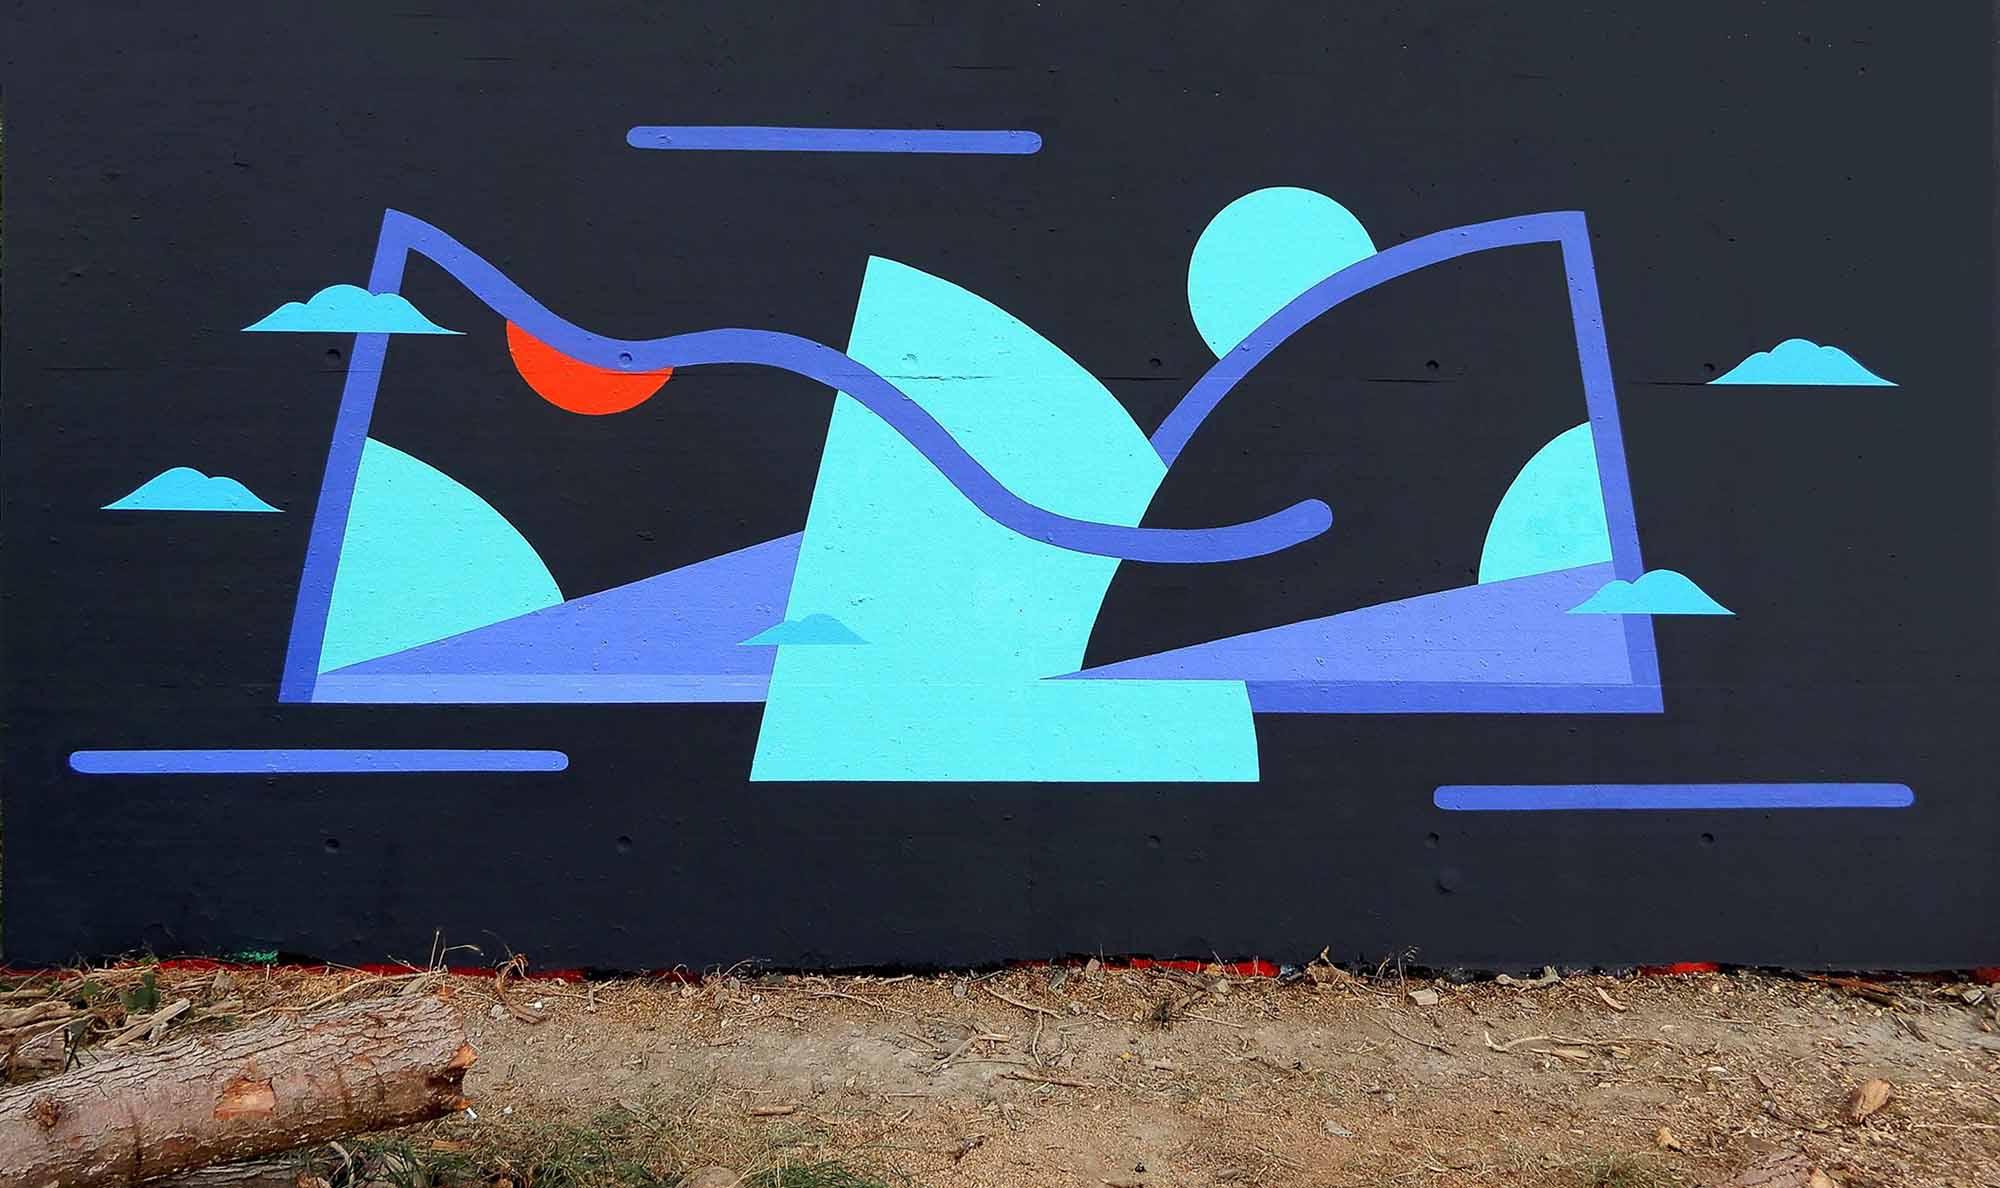 https://www.propaganza.be/wp-content/uploads/2019/04/benjamin-hendlisz-abstract-street-art-3.jpg